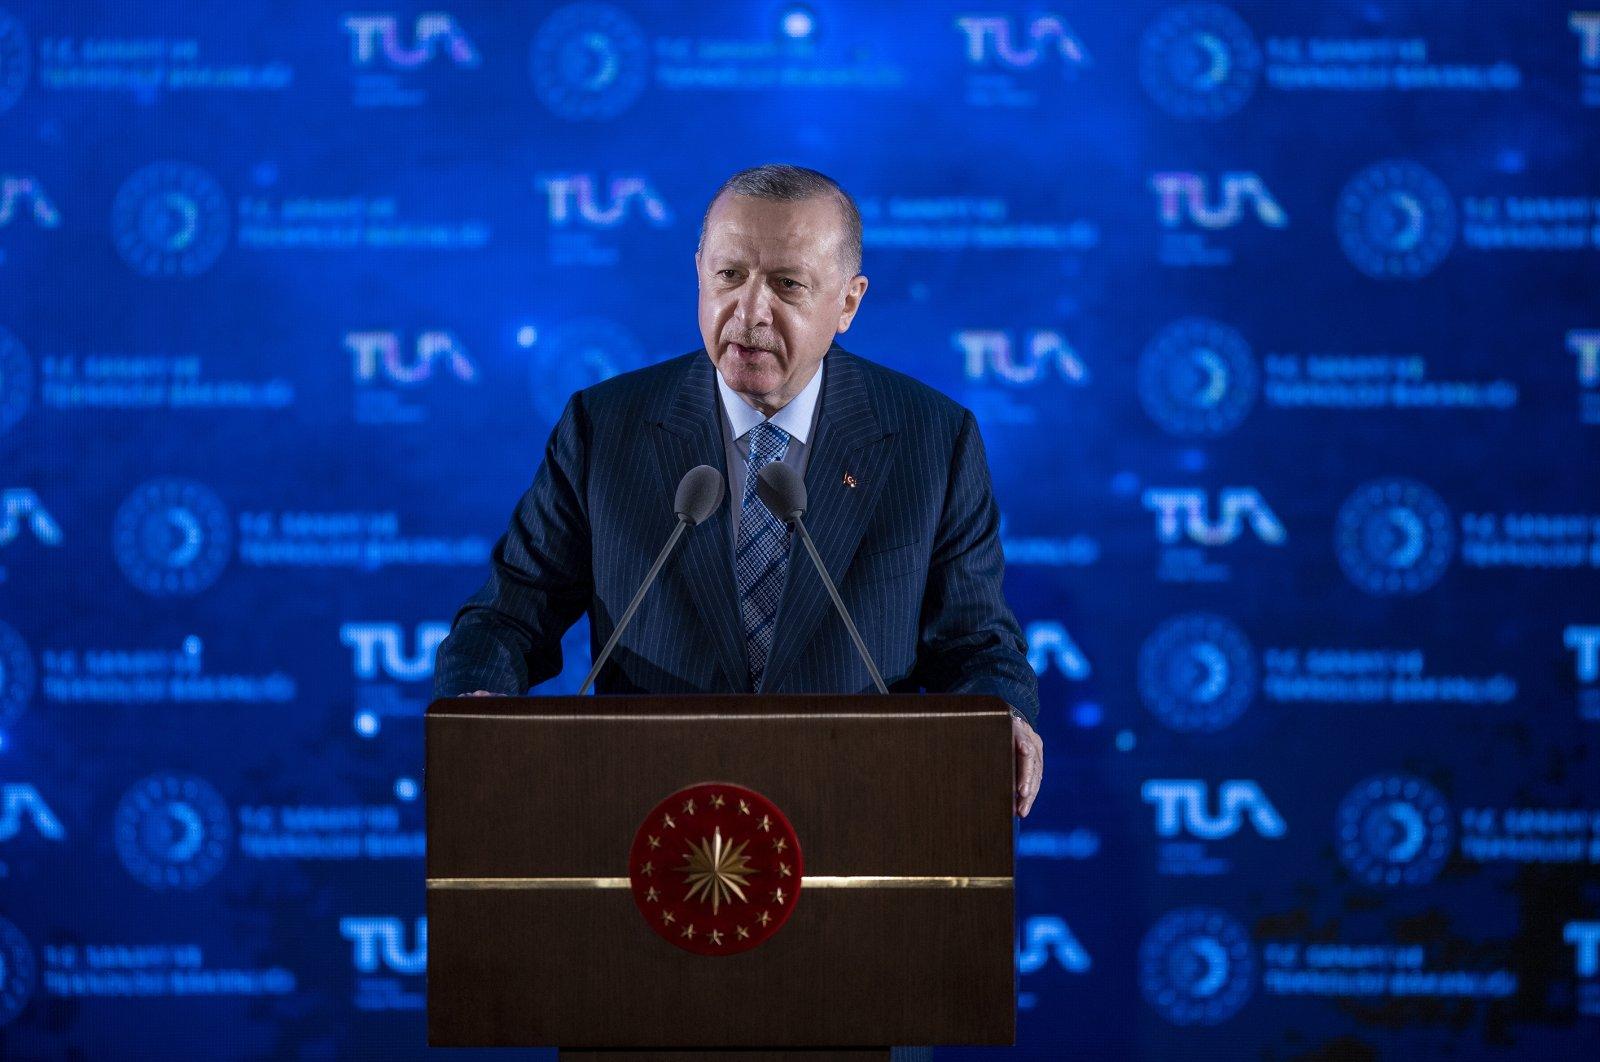 President Erdoğan speaks during the inauguration ceremony of Turkey's National Space Program in Ankara on Feb. 9, 2021 (AA Photo)